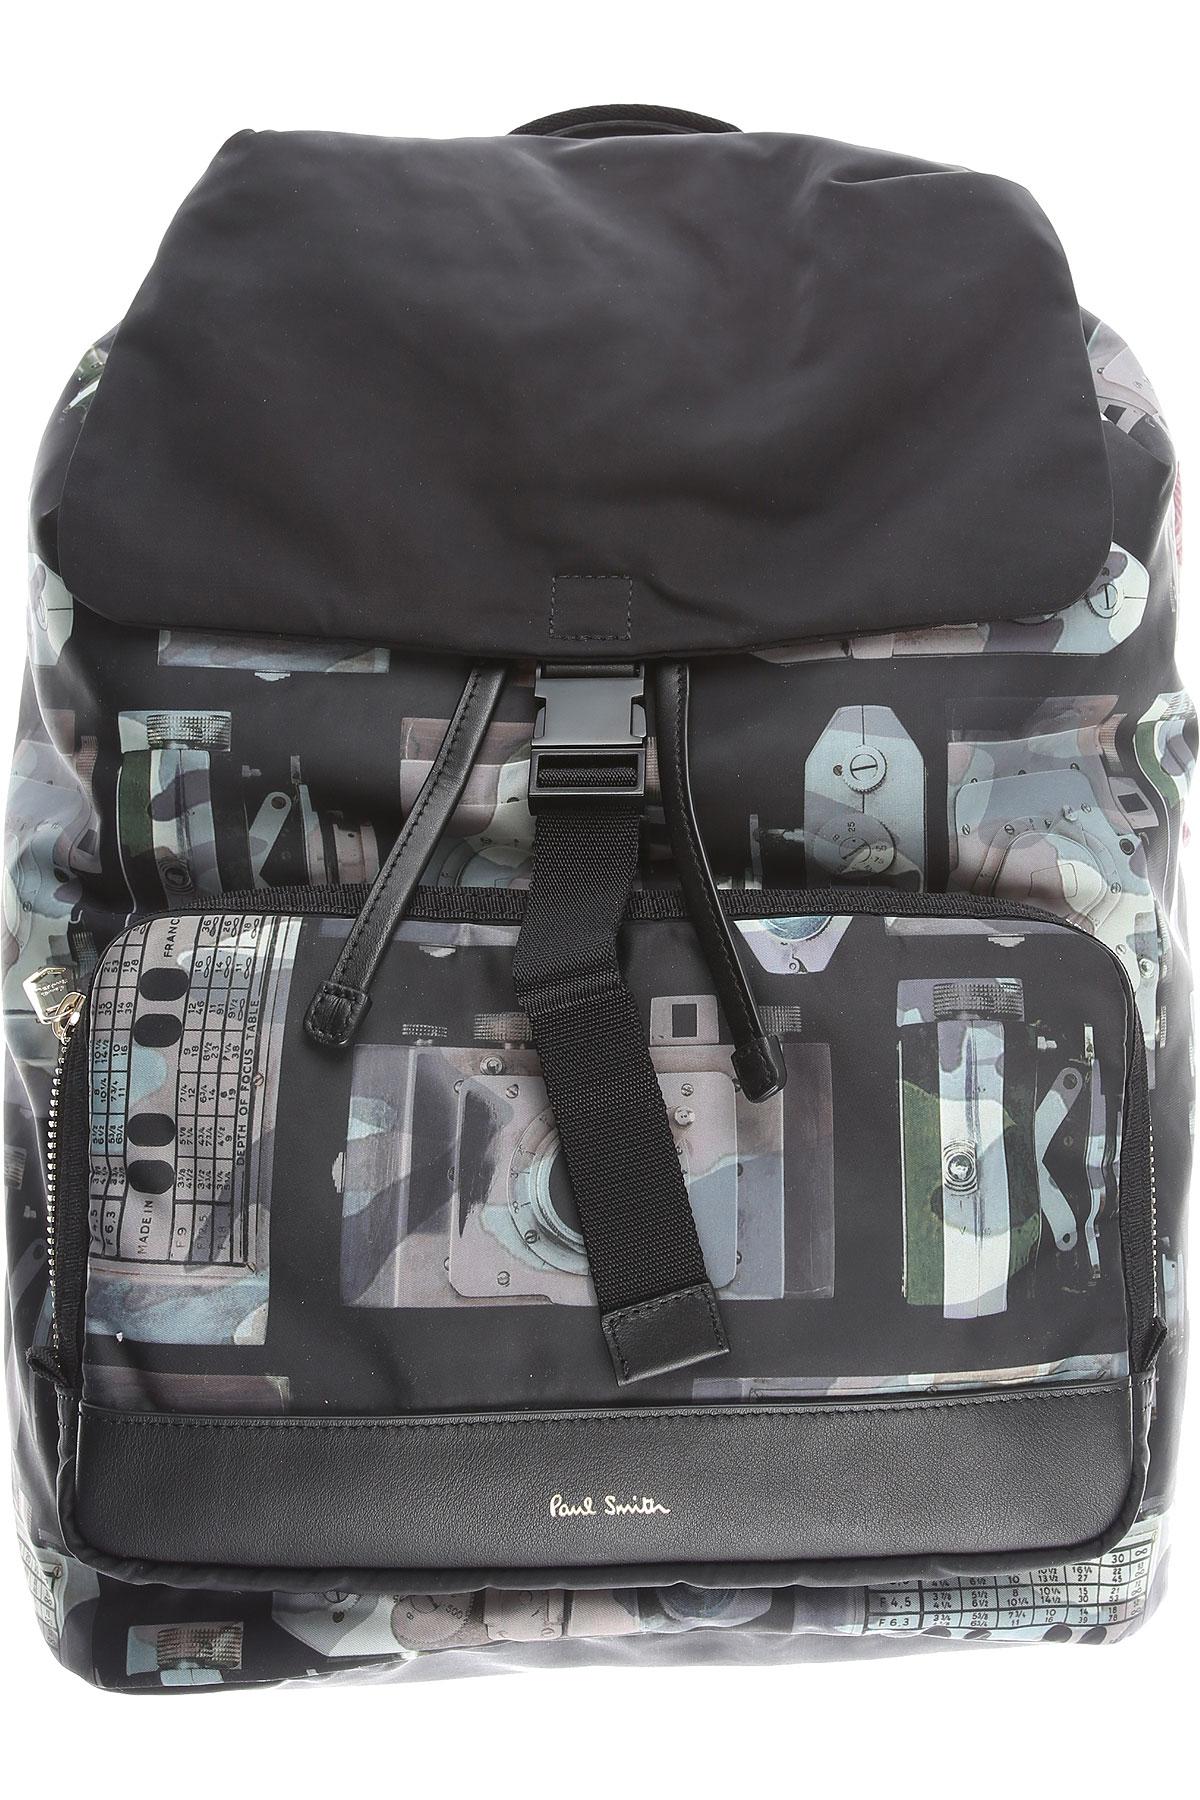 Paul Smith Backpack for Men On Sale, Black, polyamide, 2019